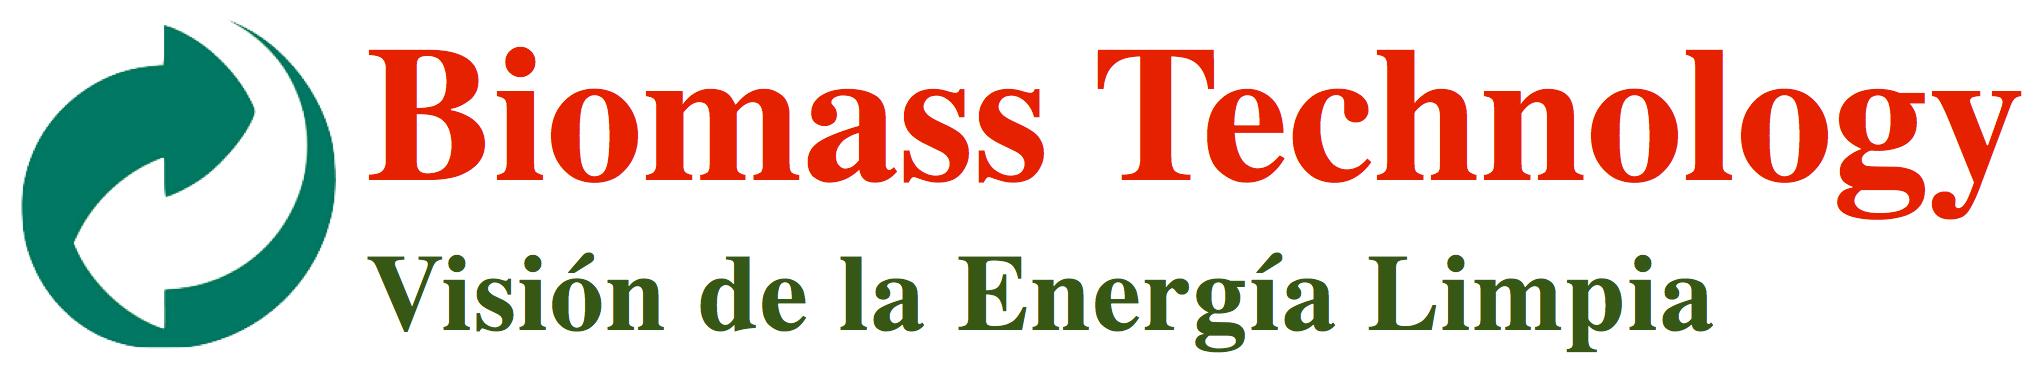 logo biomass alta negrita jpg